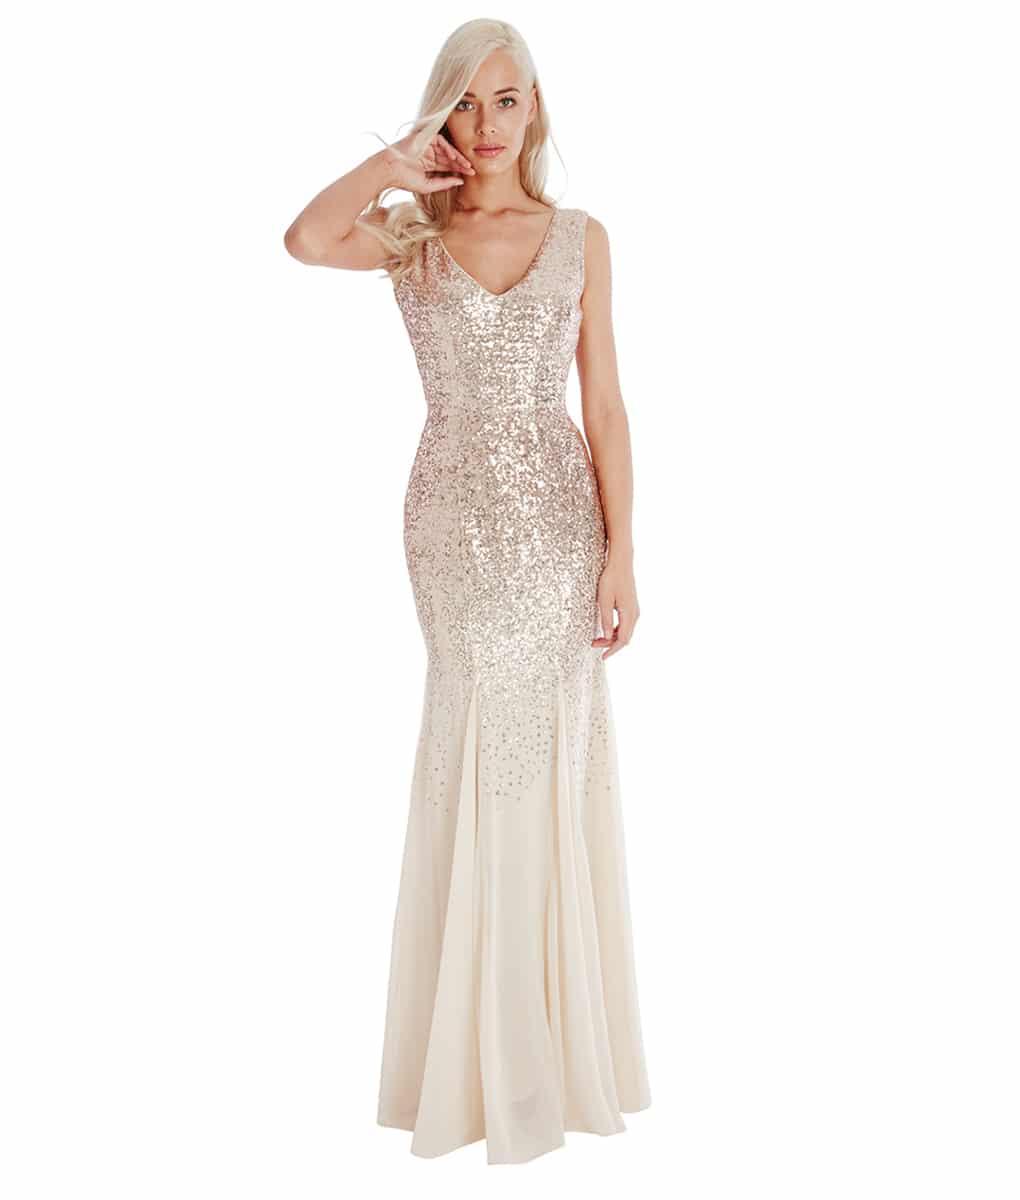 d5b84e5773b City Goddess - Champagne Sequins   Chiffon Gown